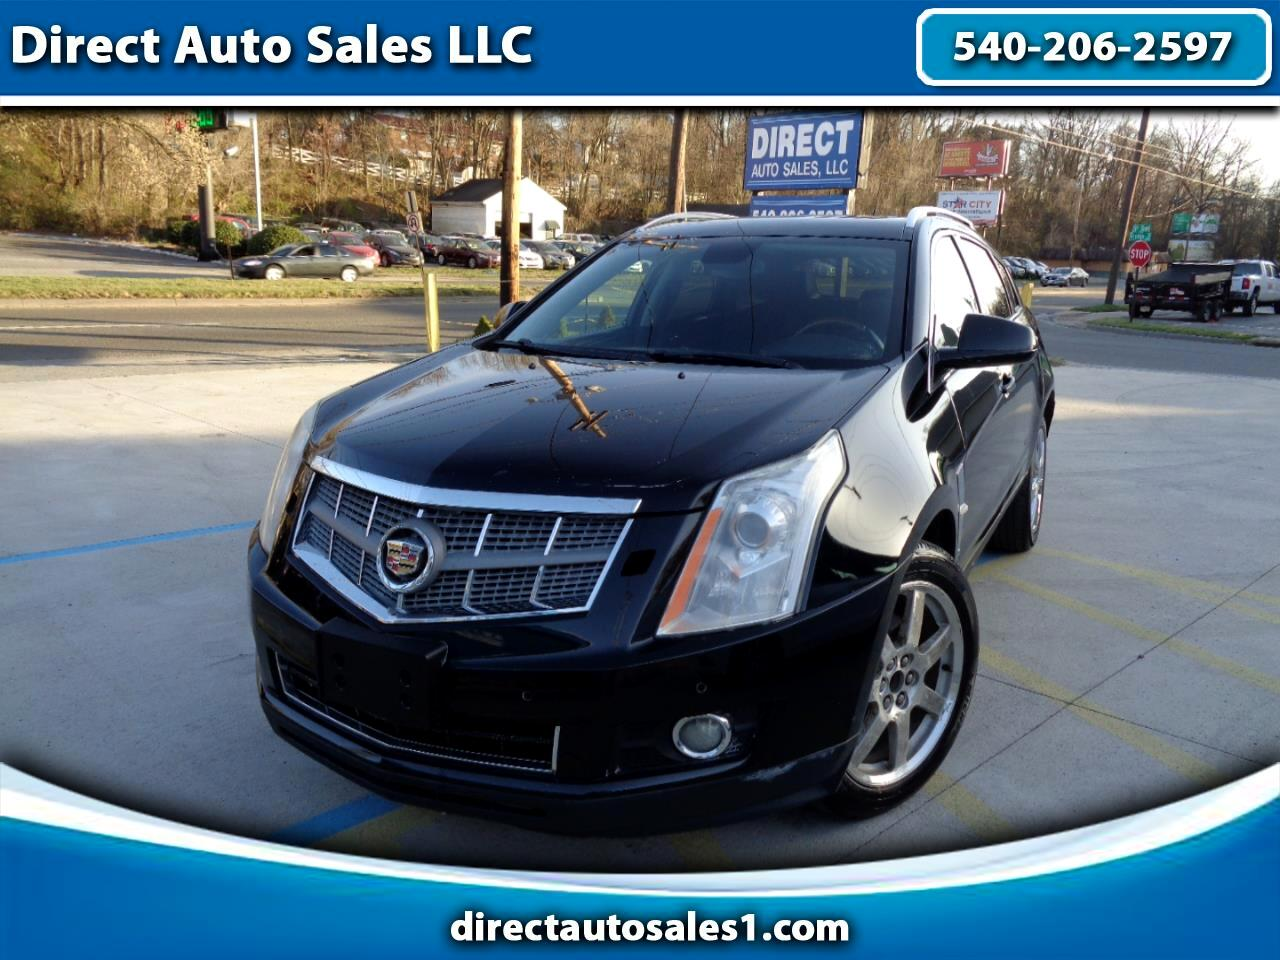 Cadillac SRX AWD 4dr Turbo Premium Collection 2010